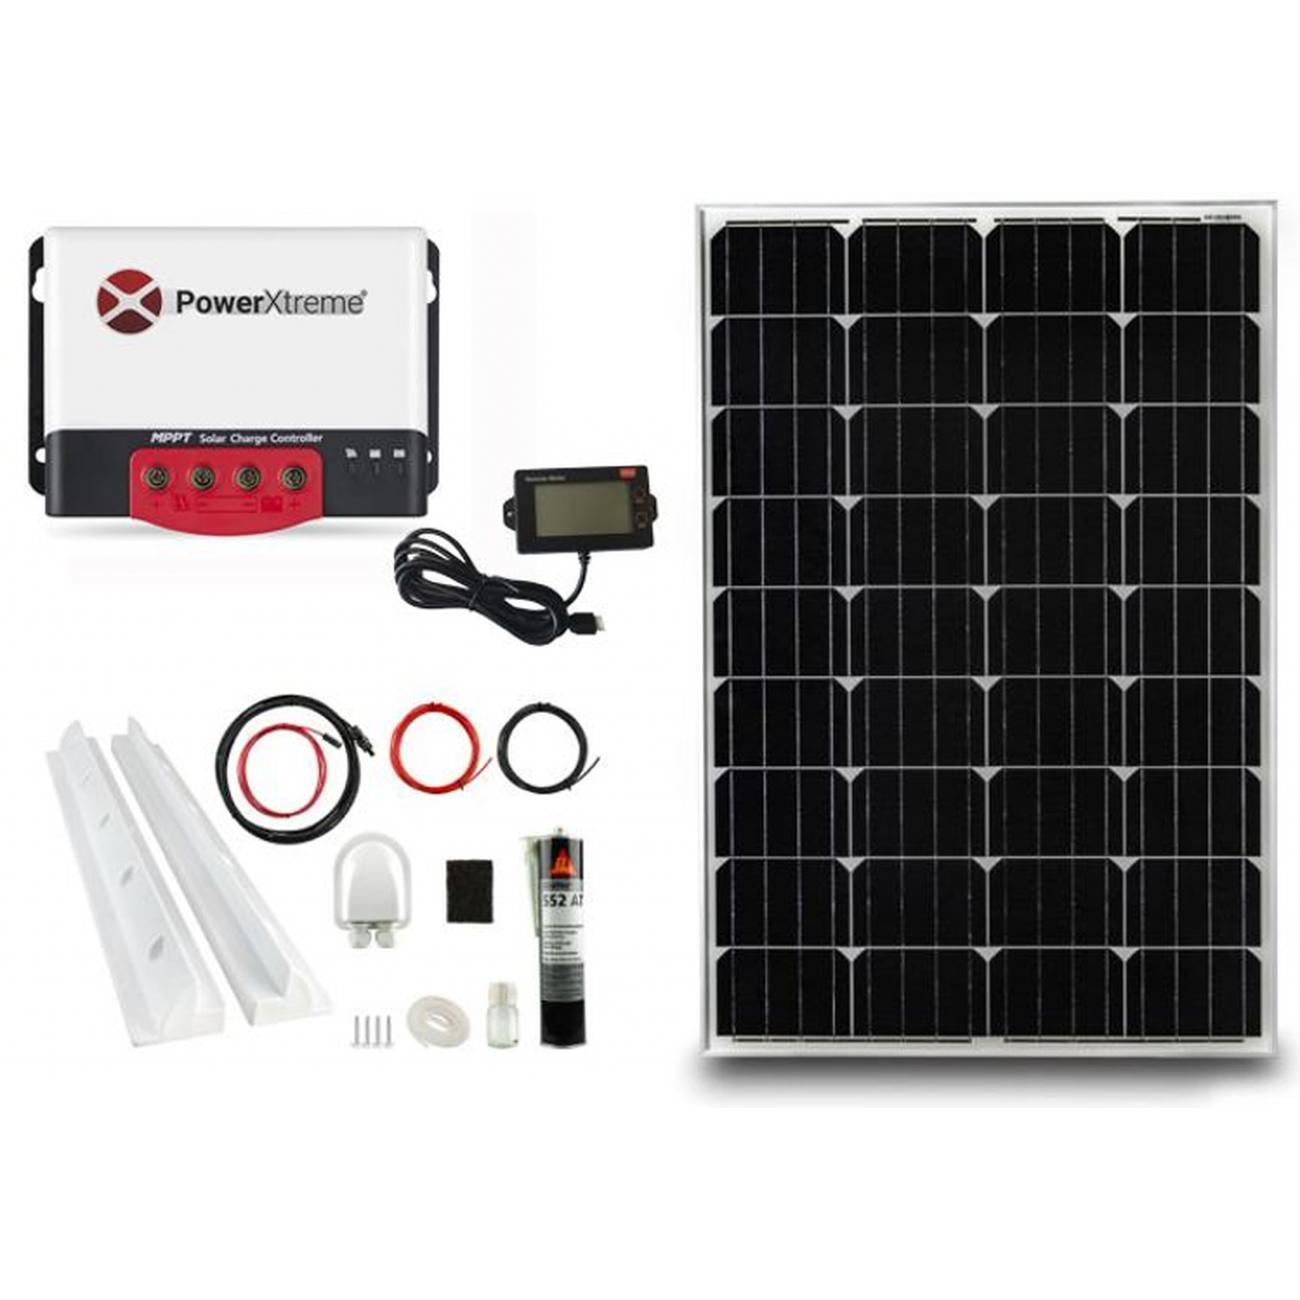 MPPT Solar Laderegler PowerXtreme XS20s Mit Display 260W Paket